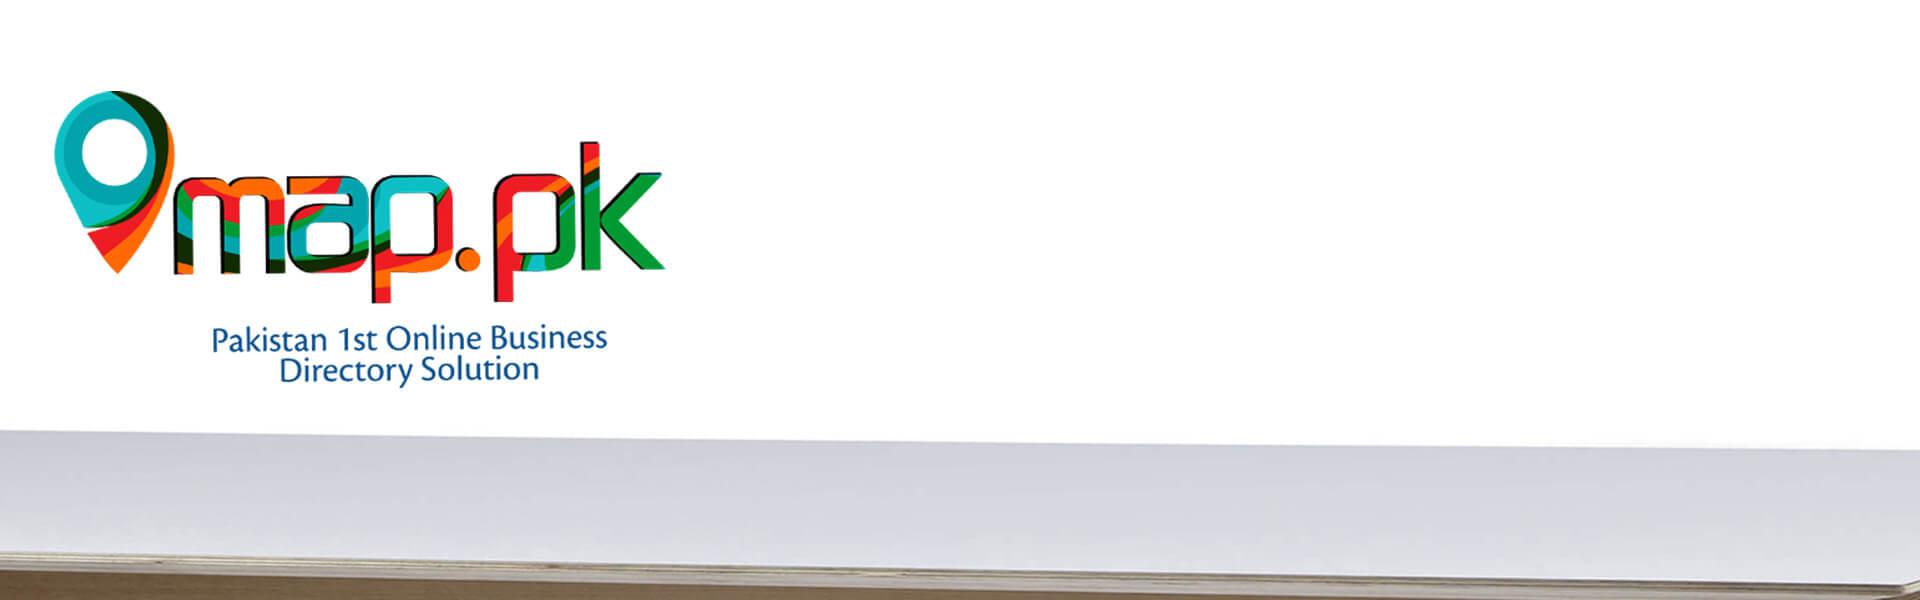 imap.pk-Logo-Banner